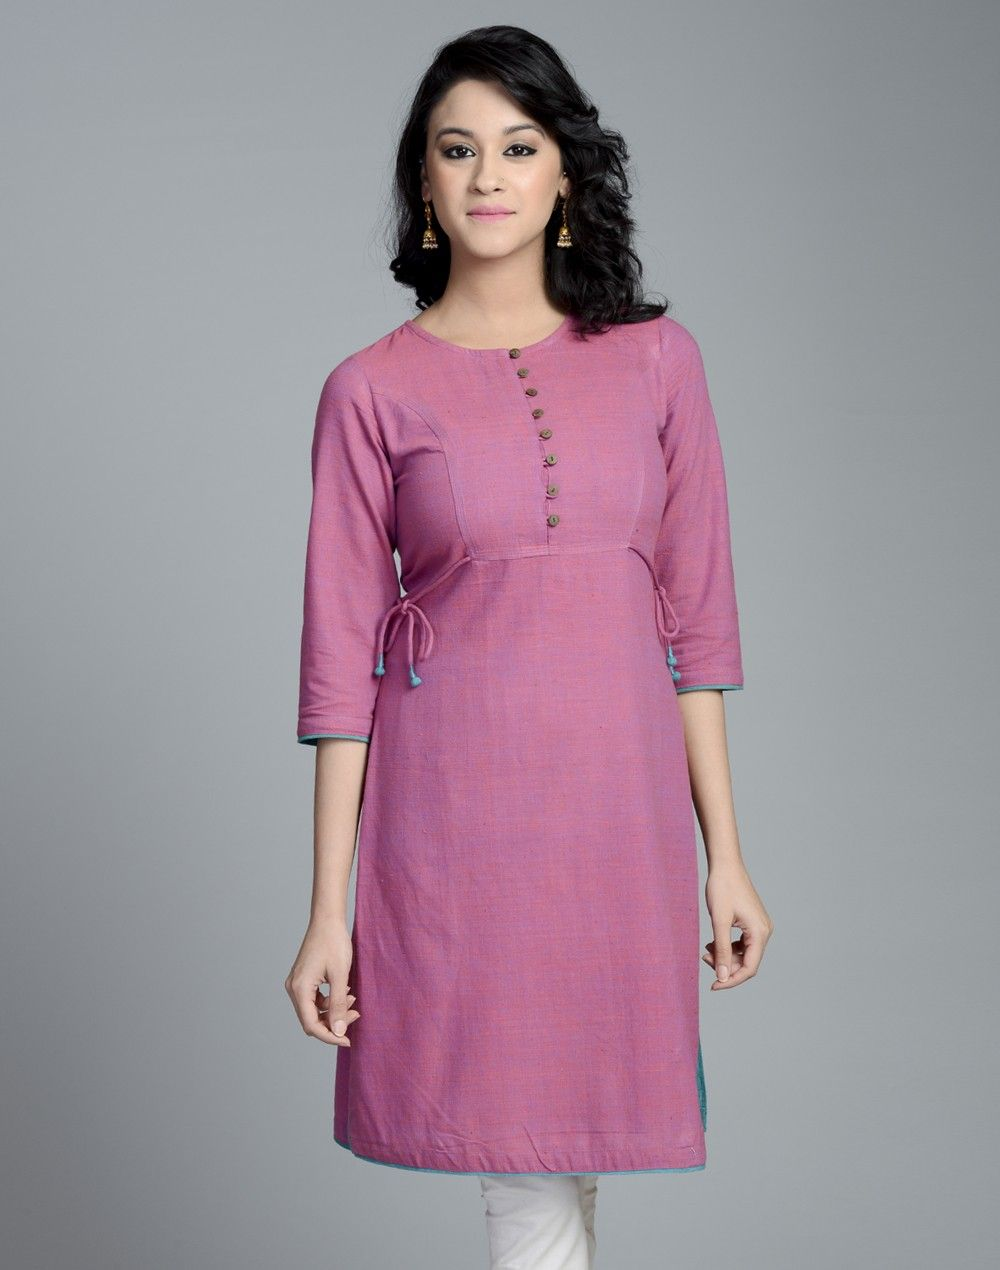 76288d67897 Cotton Khadi Round Neck Side Tie Up Long Kurta | kurtis | Fashion ...